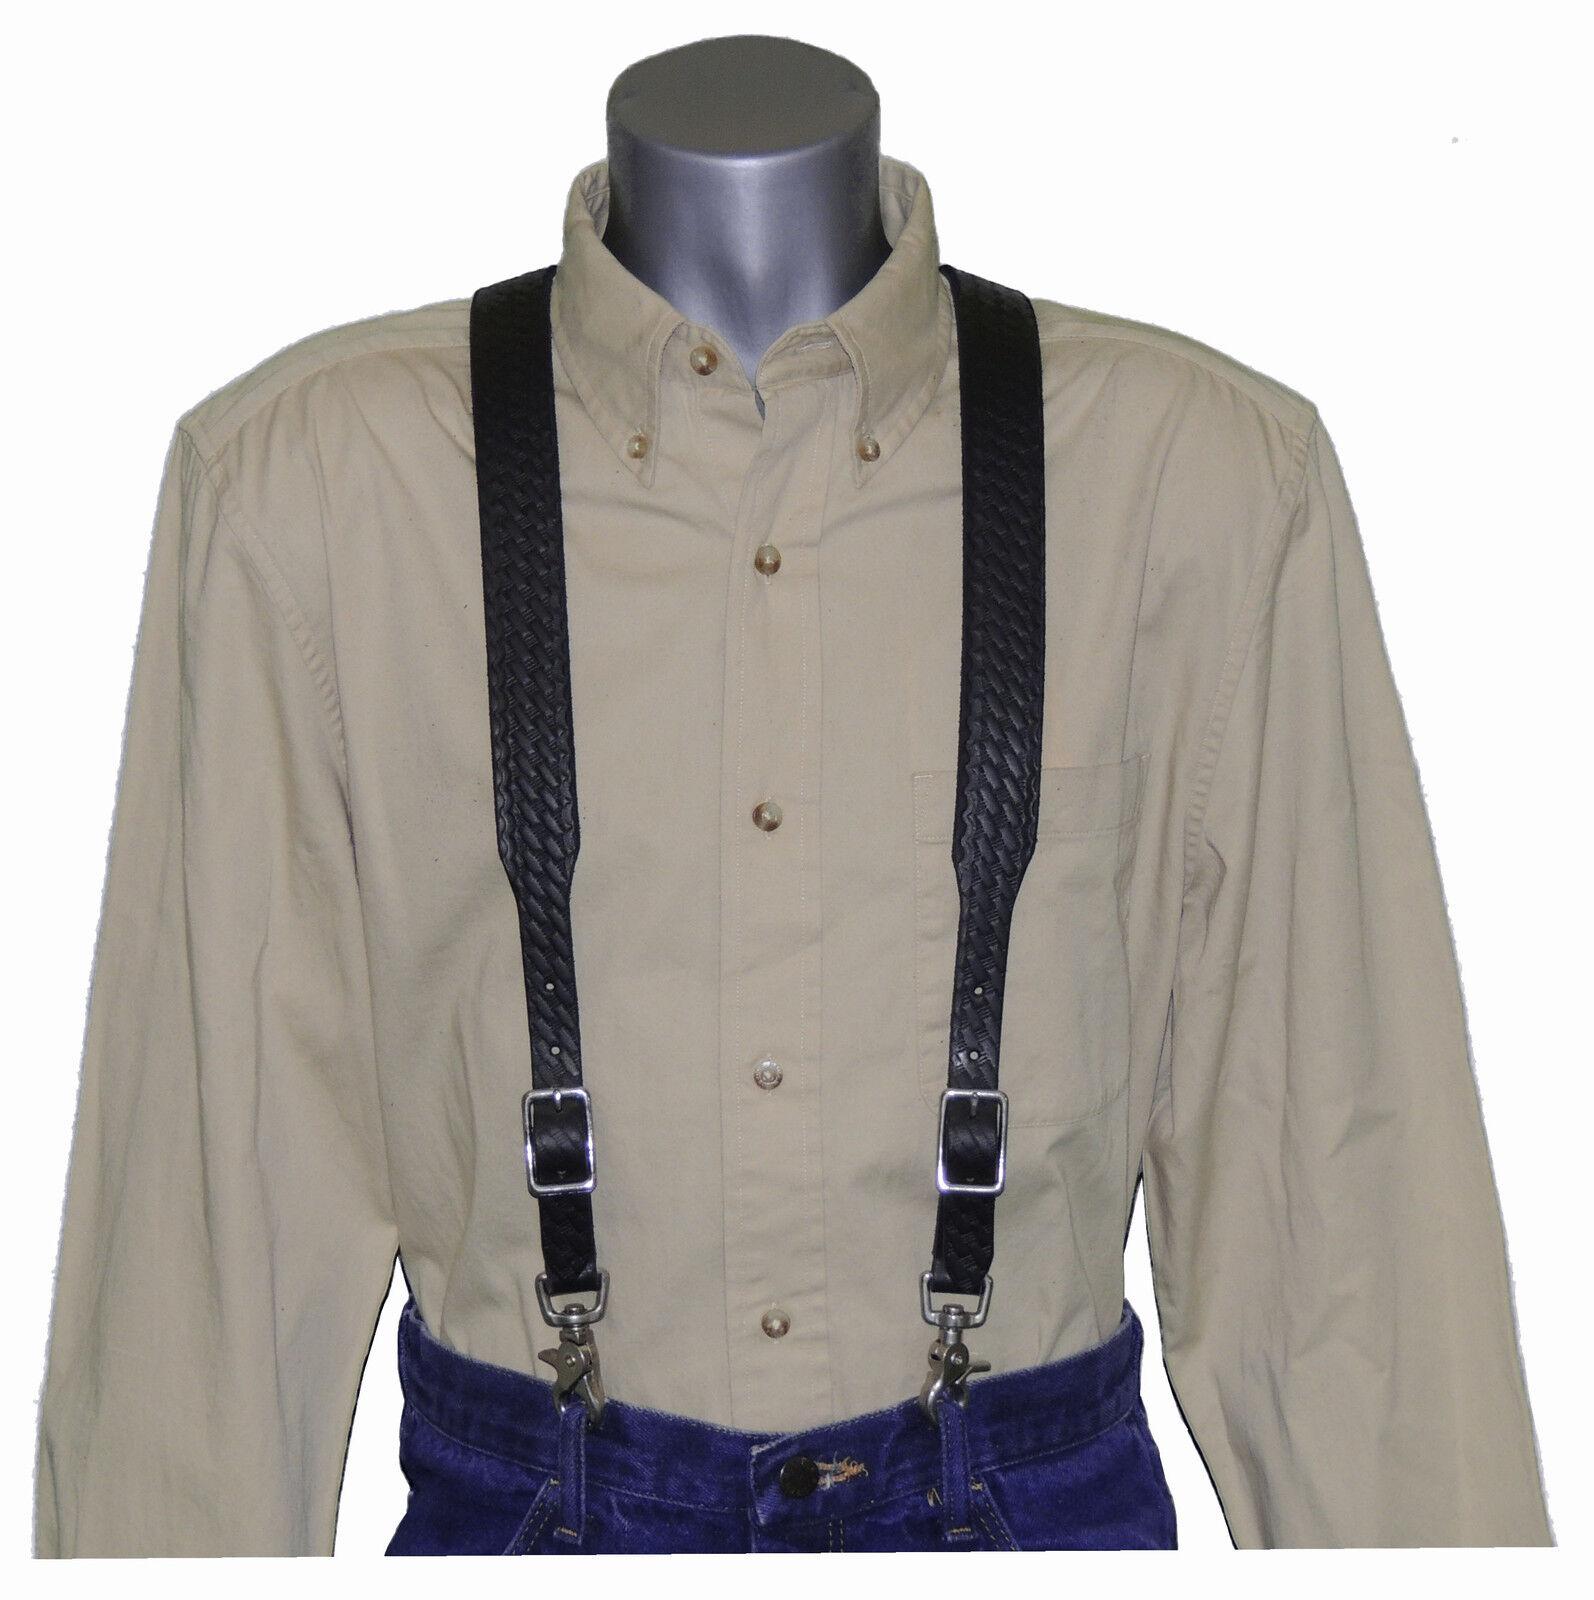 Black Basket Weave Leather Suspenders with trigger scissor snaps no slip